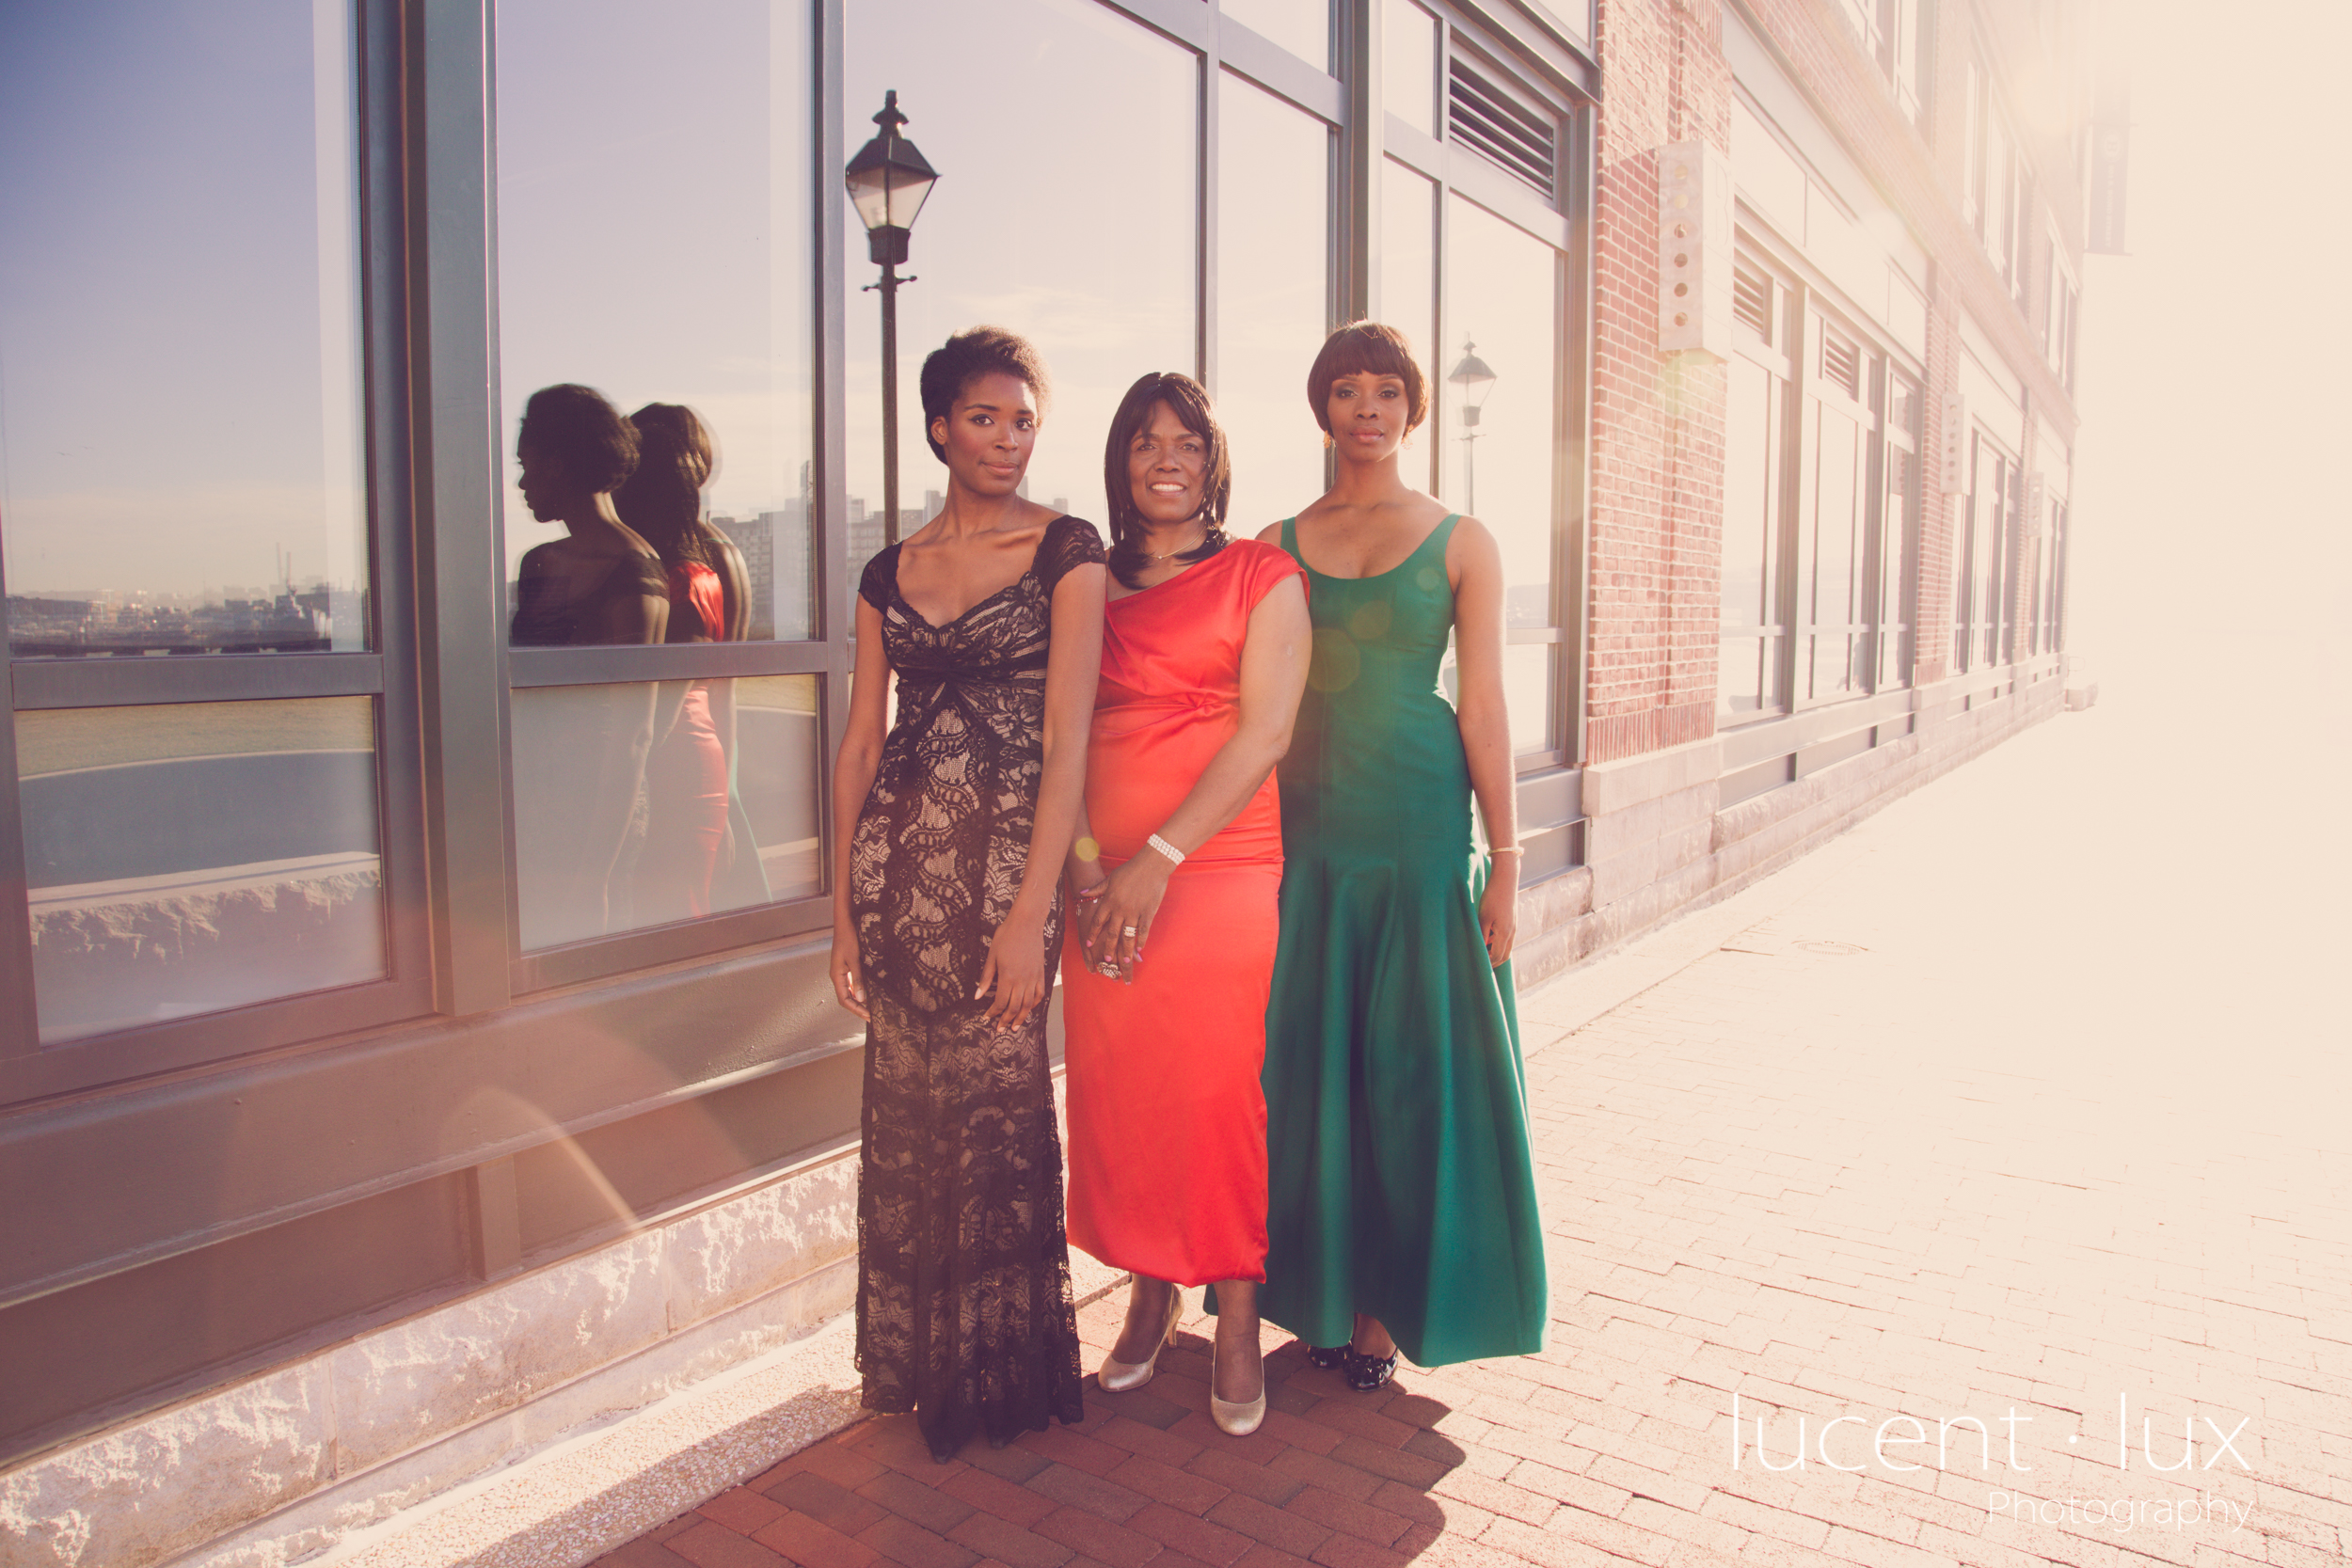 Fells-Point-Baltimore-Maryland-Photography-Photographer-Family-Portraits-Fells-Point-115.jpg